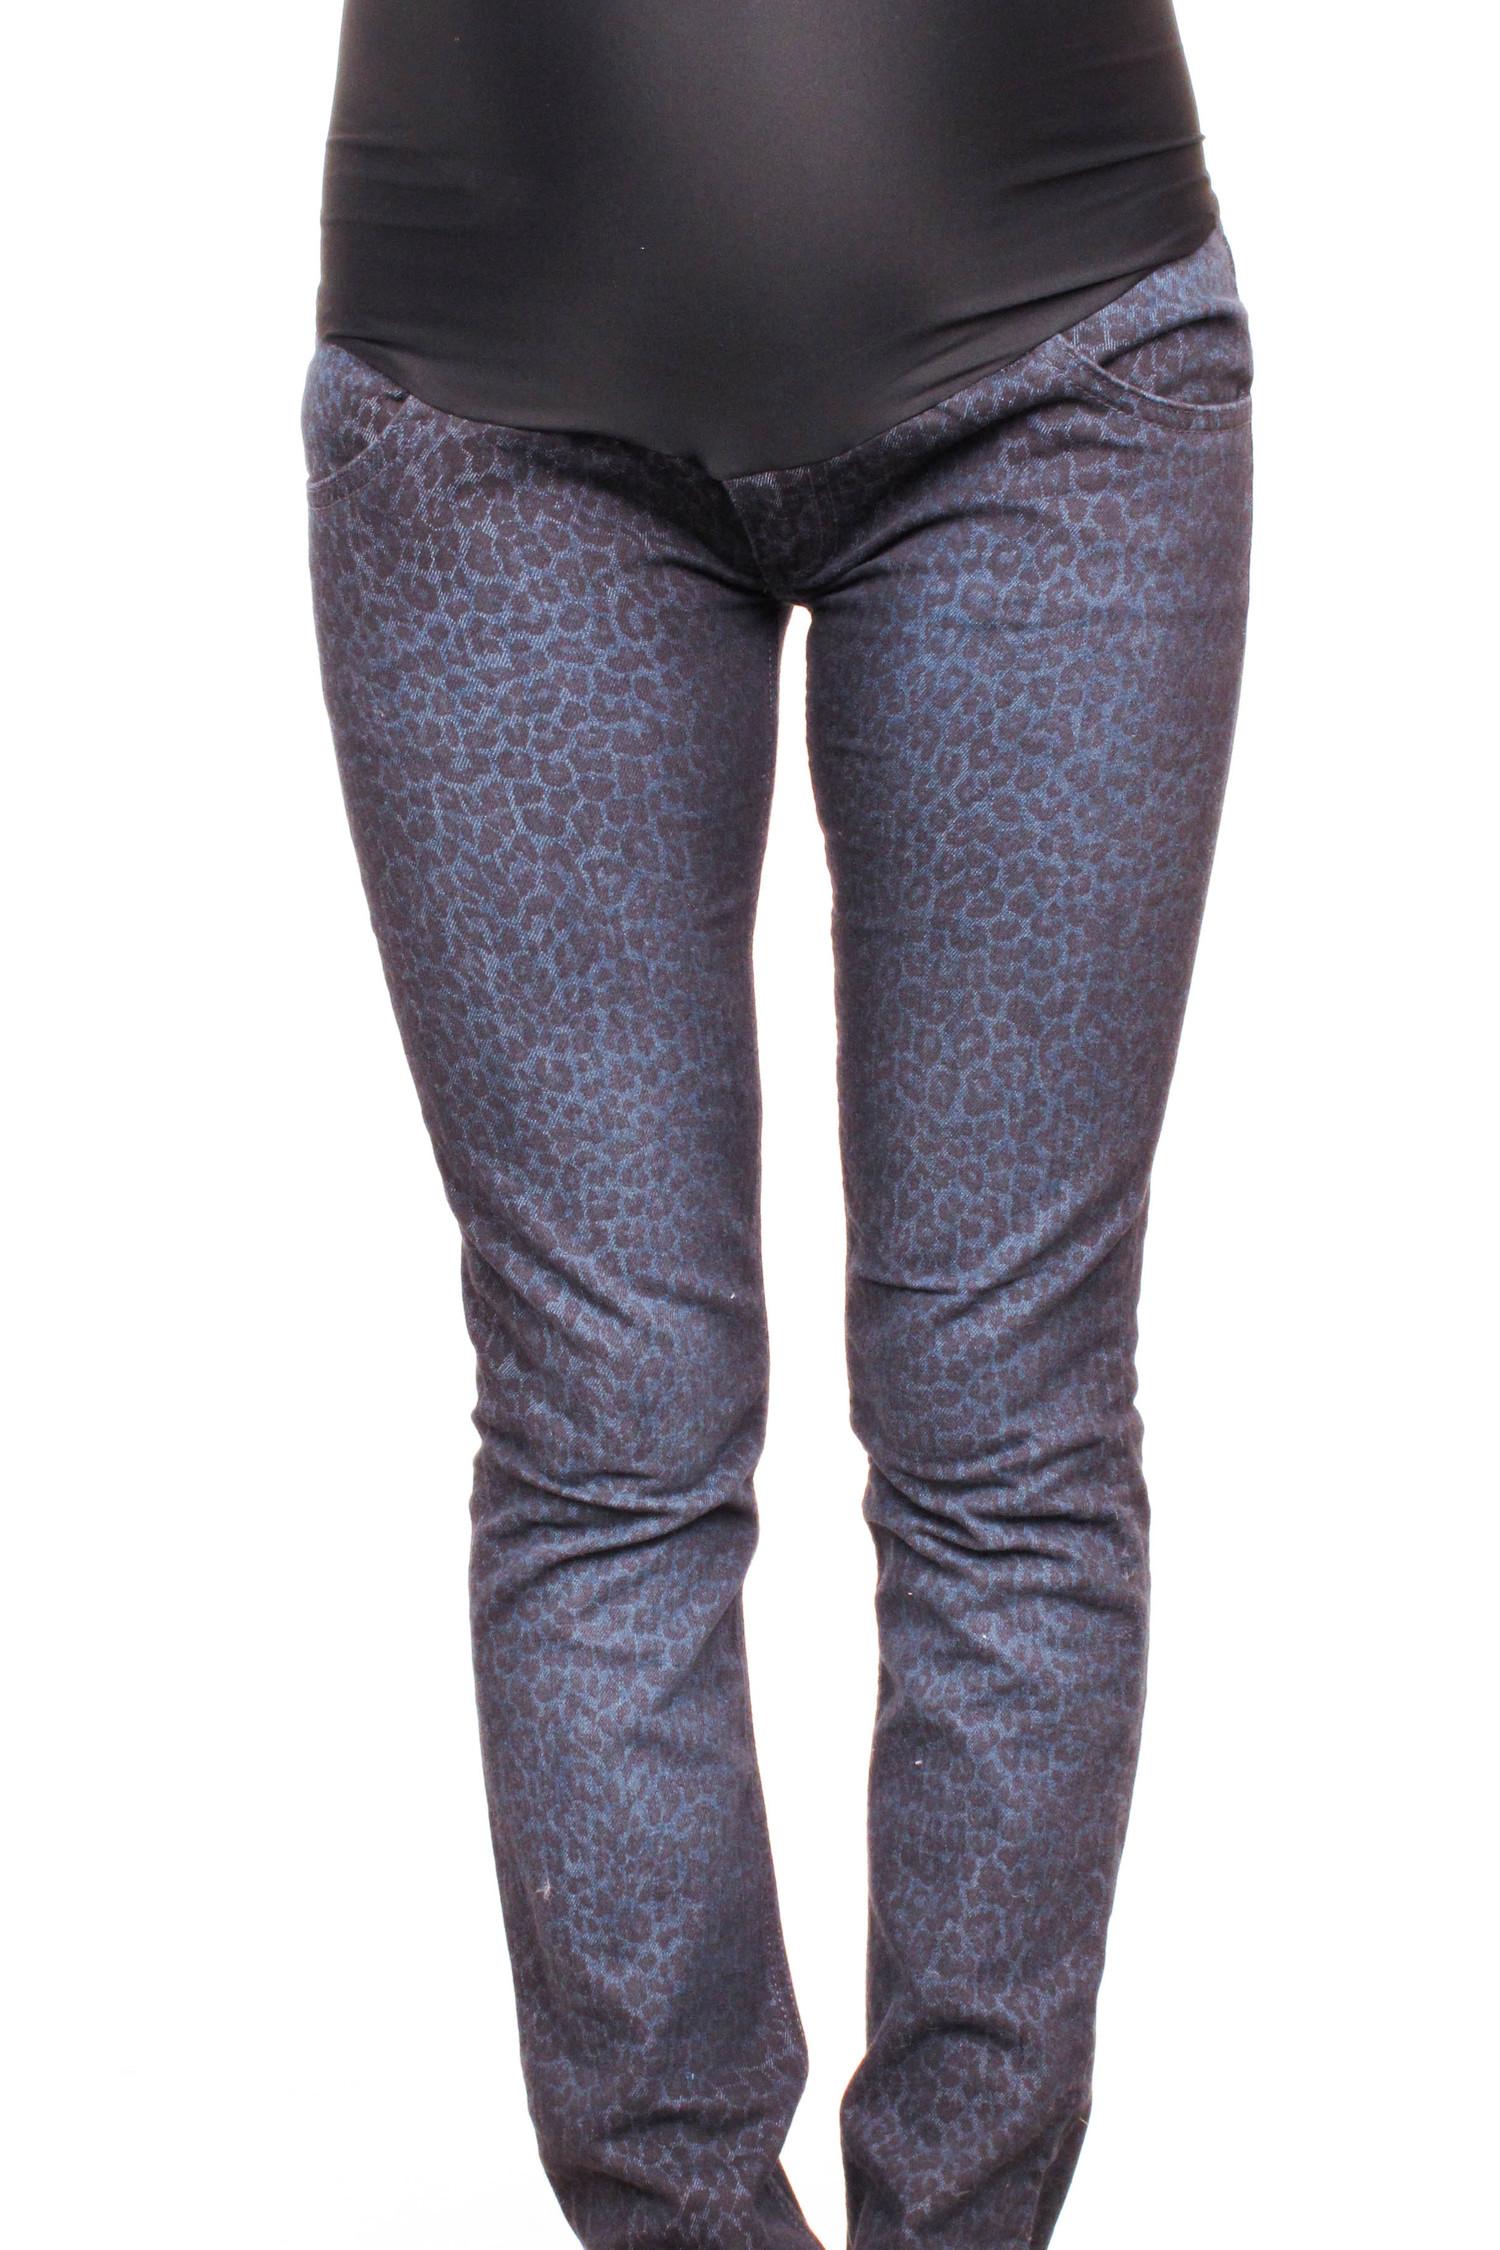 bcf36af42 Zara TRF Leopard Skinny Maternity Jeans 30 x 35 — She   Wolf